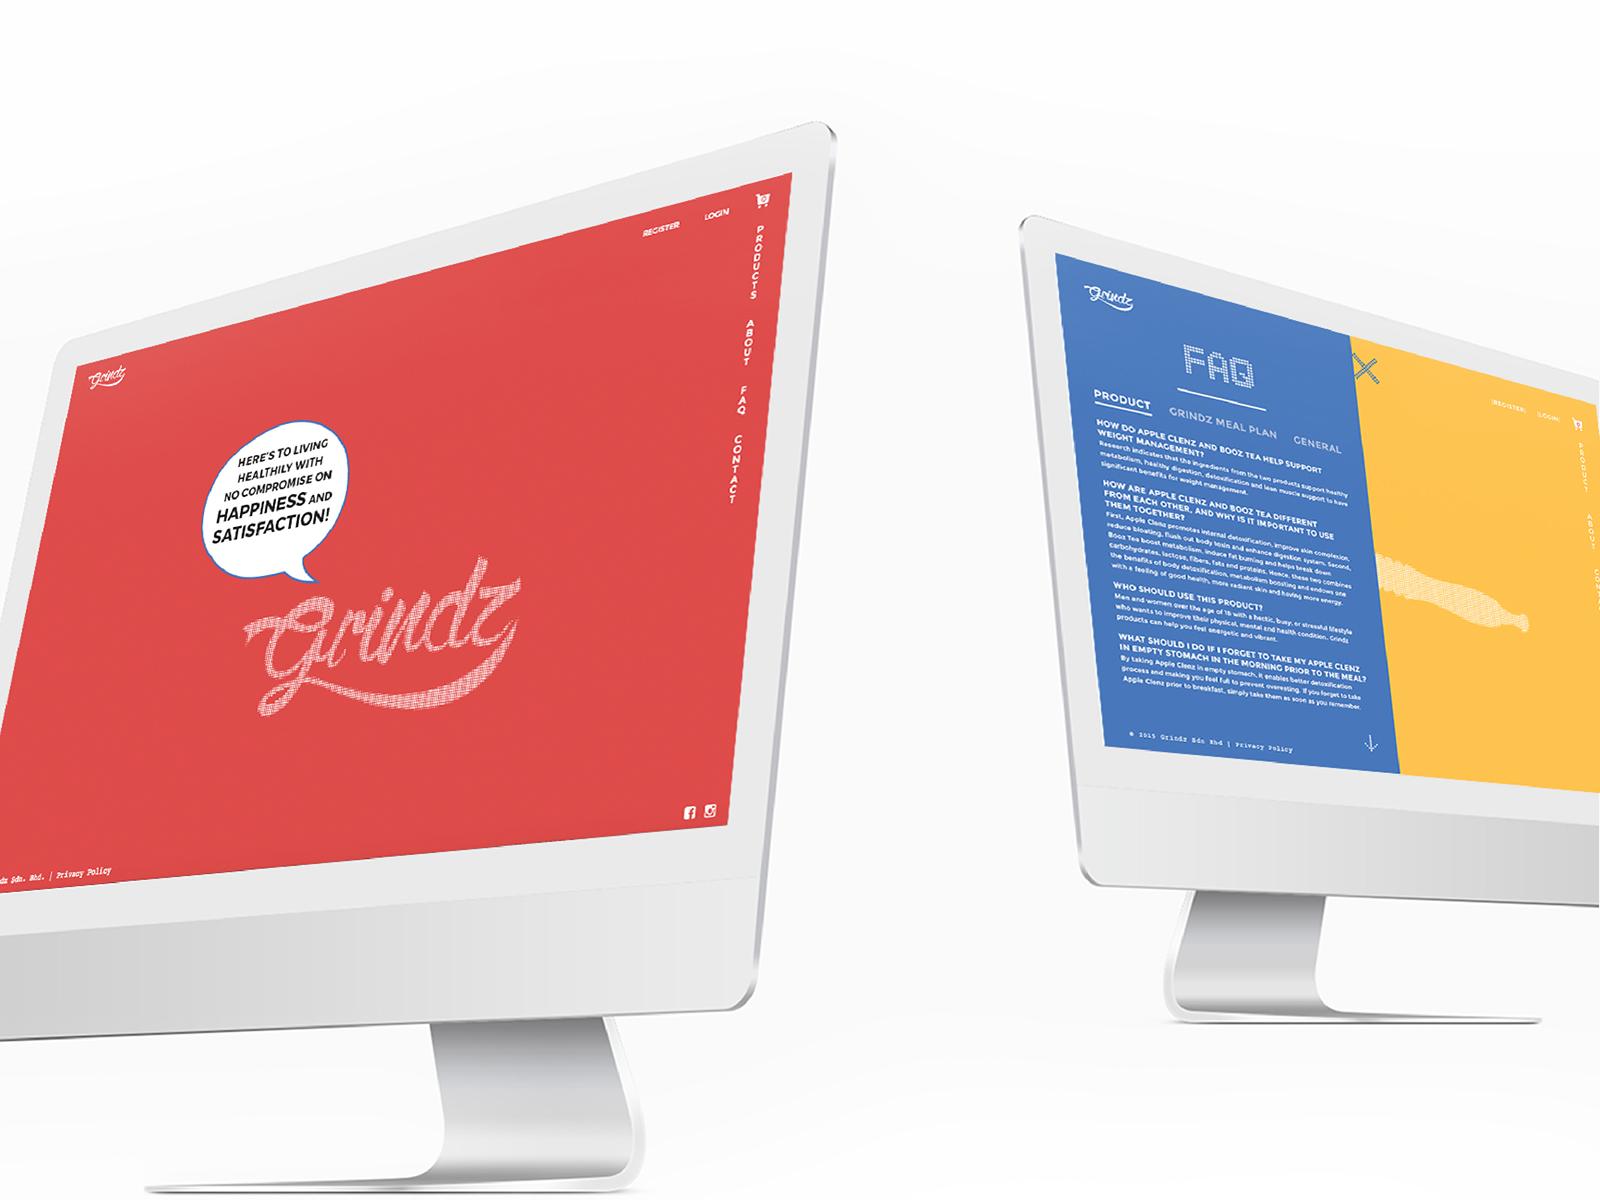 Grindz supplement brand website desktop view showing landing and FAQ page